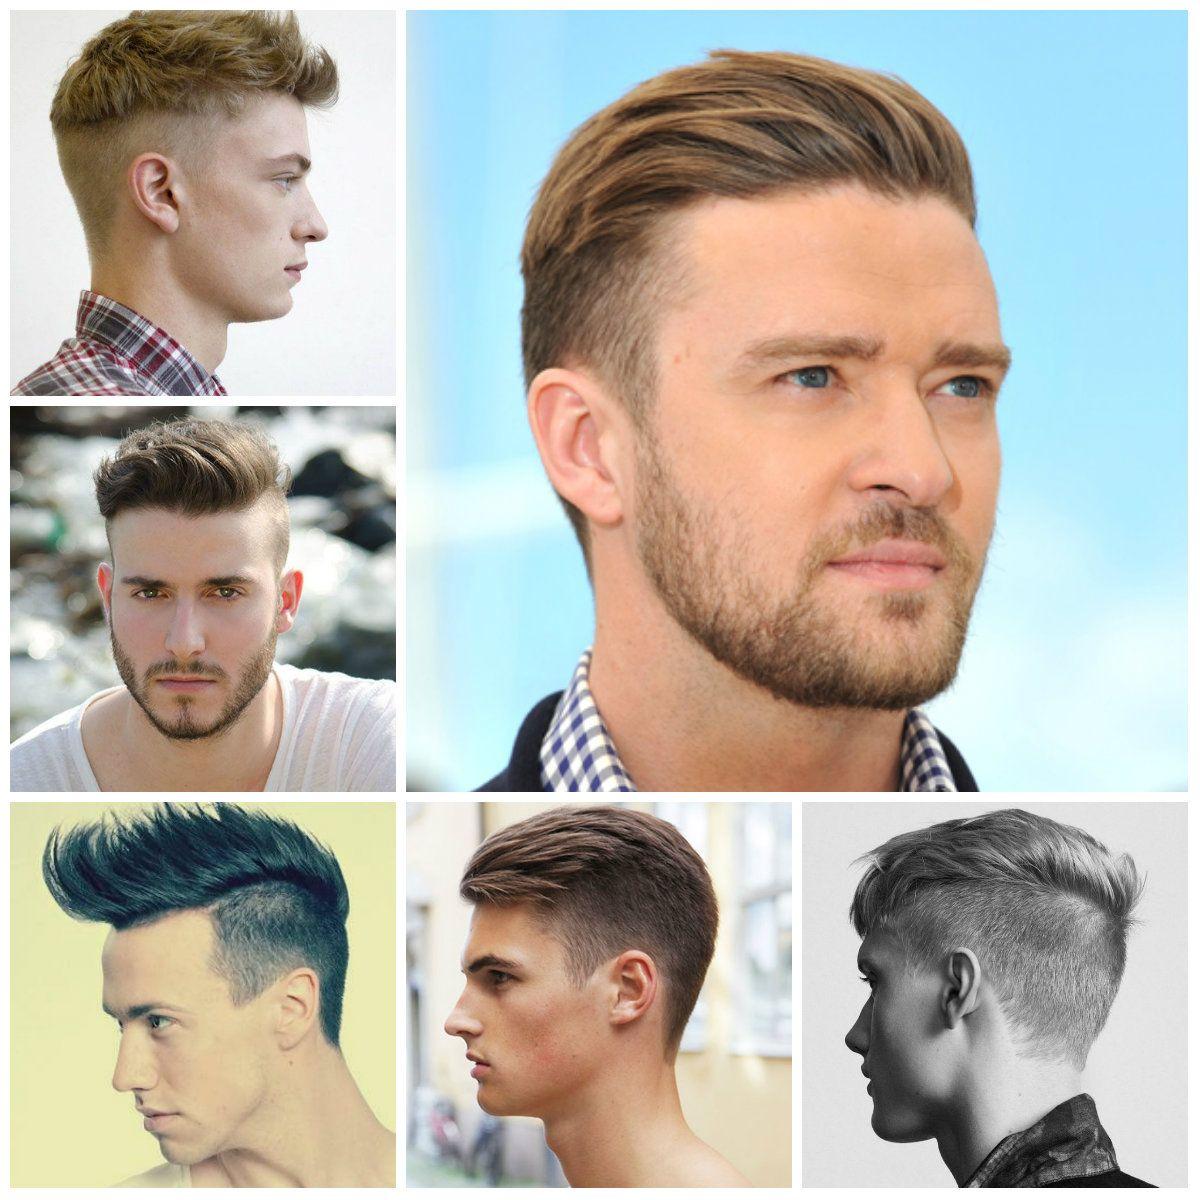 Undercut hairstyles for men men s hairstyles and haircuts for 2017 - Men S Undercut Hairstyles For 2016